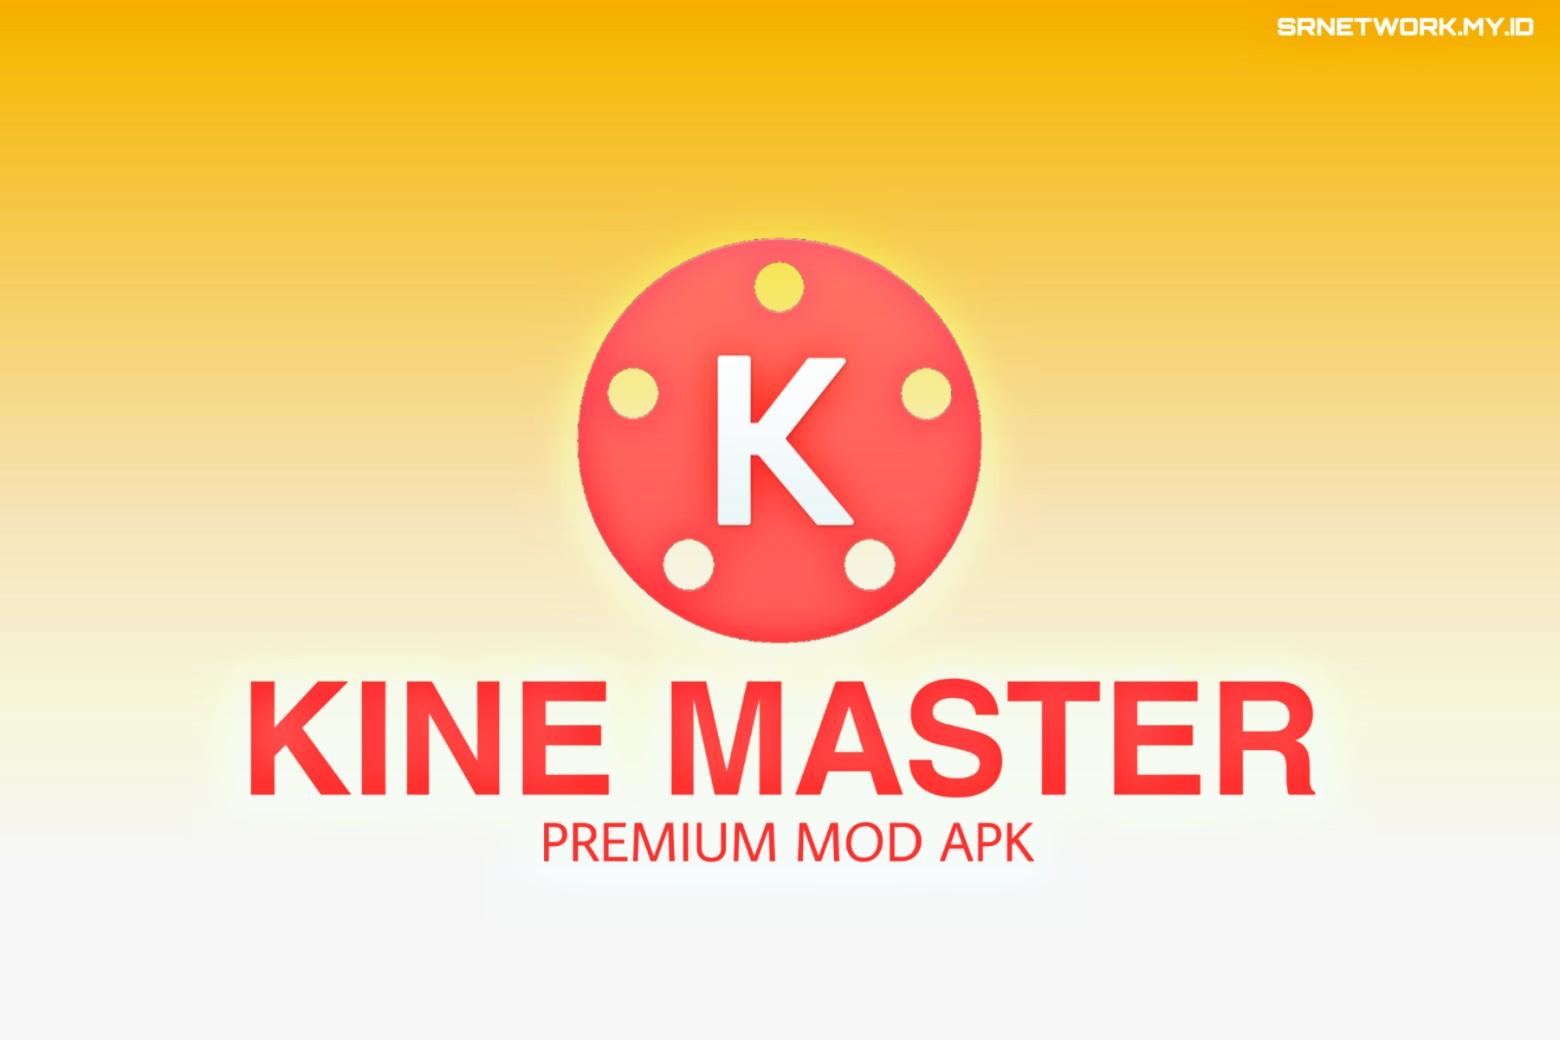 Kine master, no watermark